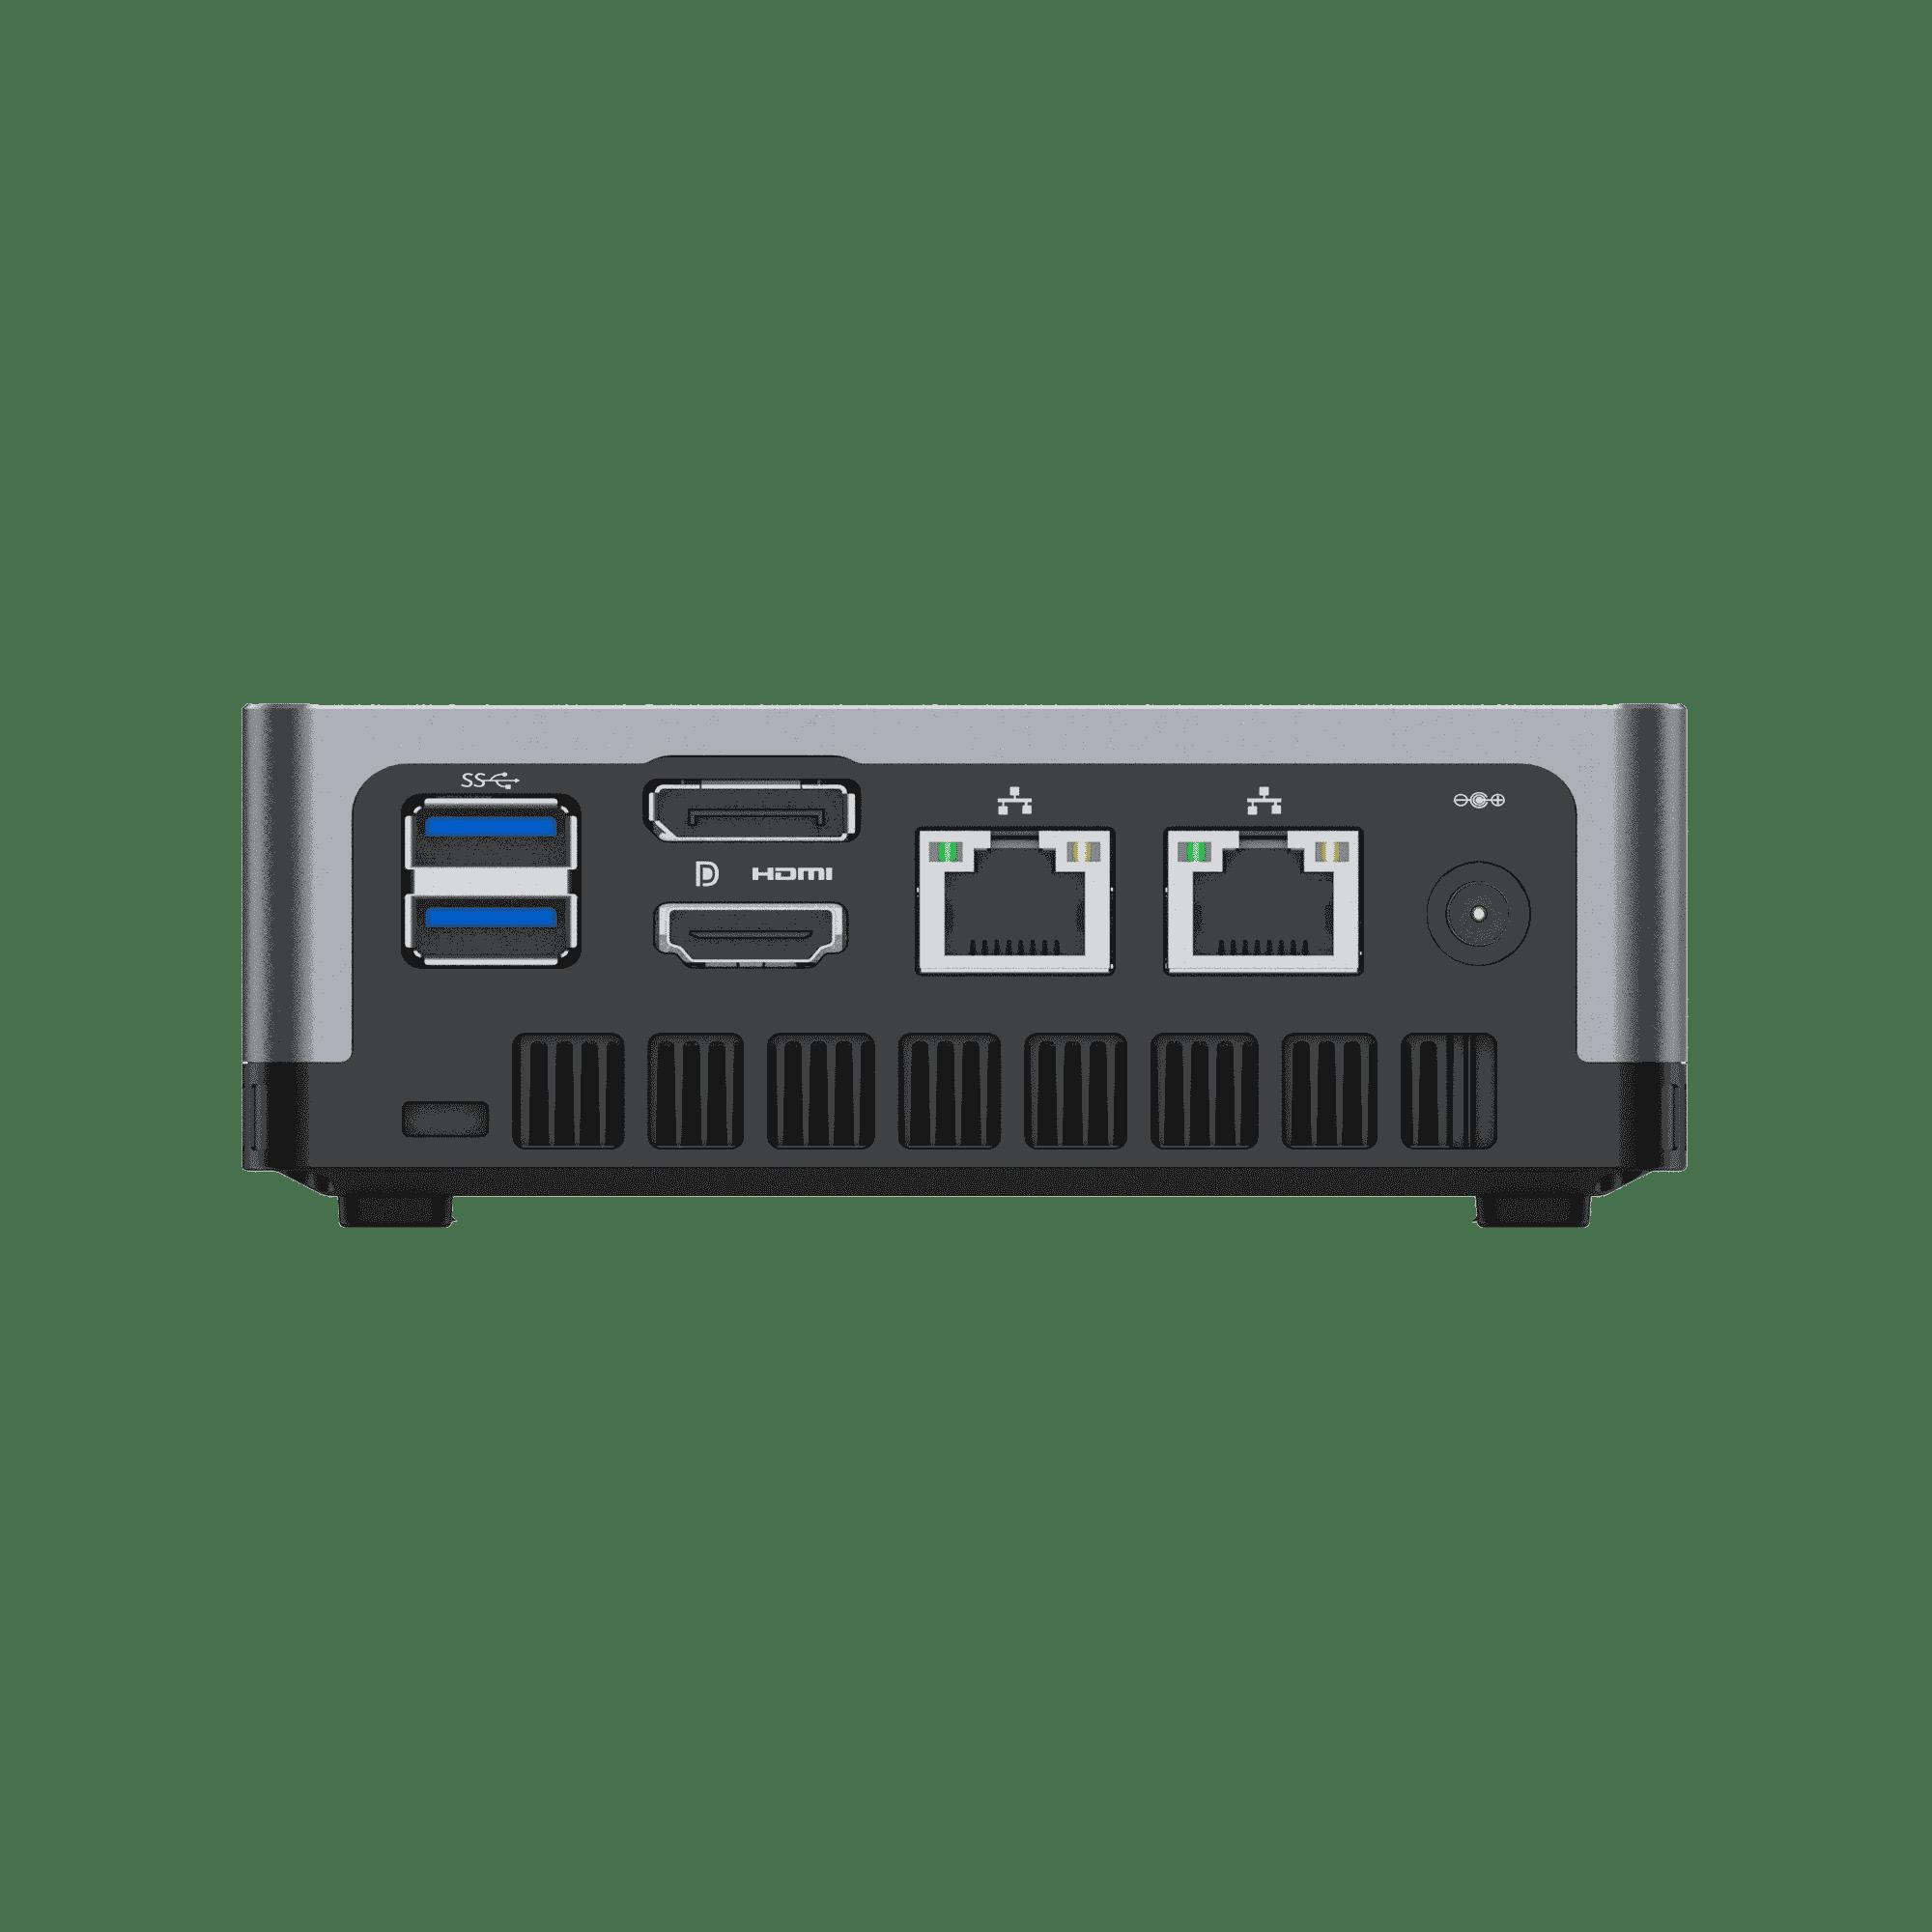 MinisForum EliteMini UM700 - Showing Rear I/O which is 2x USB Type-A 3.0, 1x HDMI, 1x DisplayPort, 2x RJ45 Ethernet Ports and Power Port